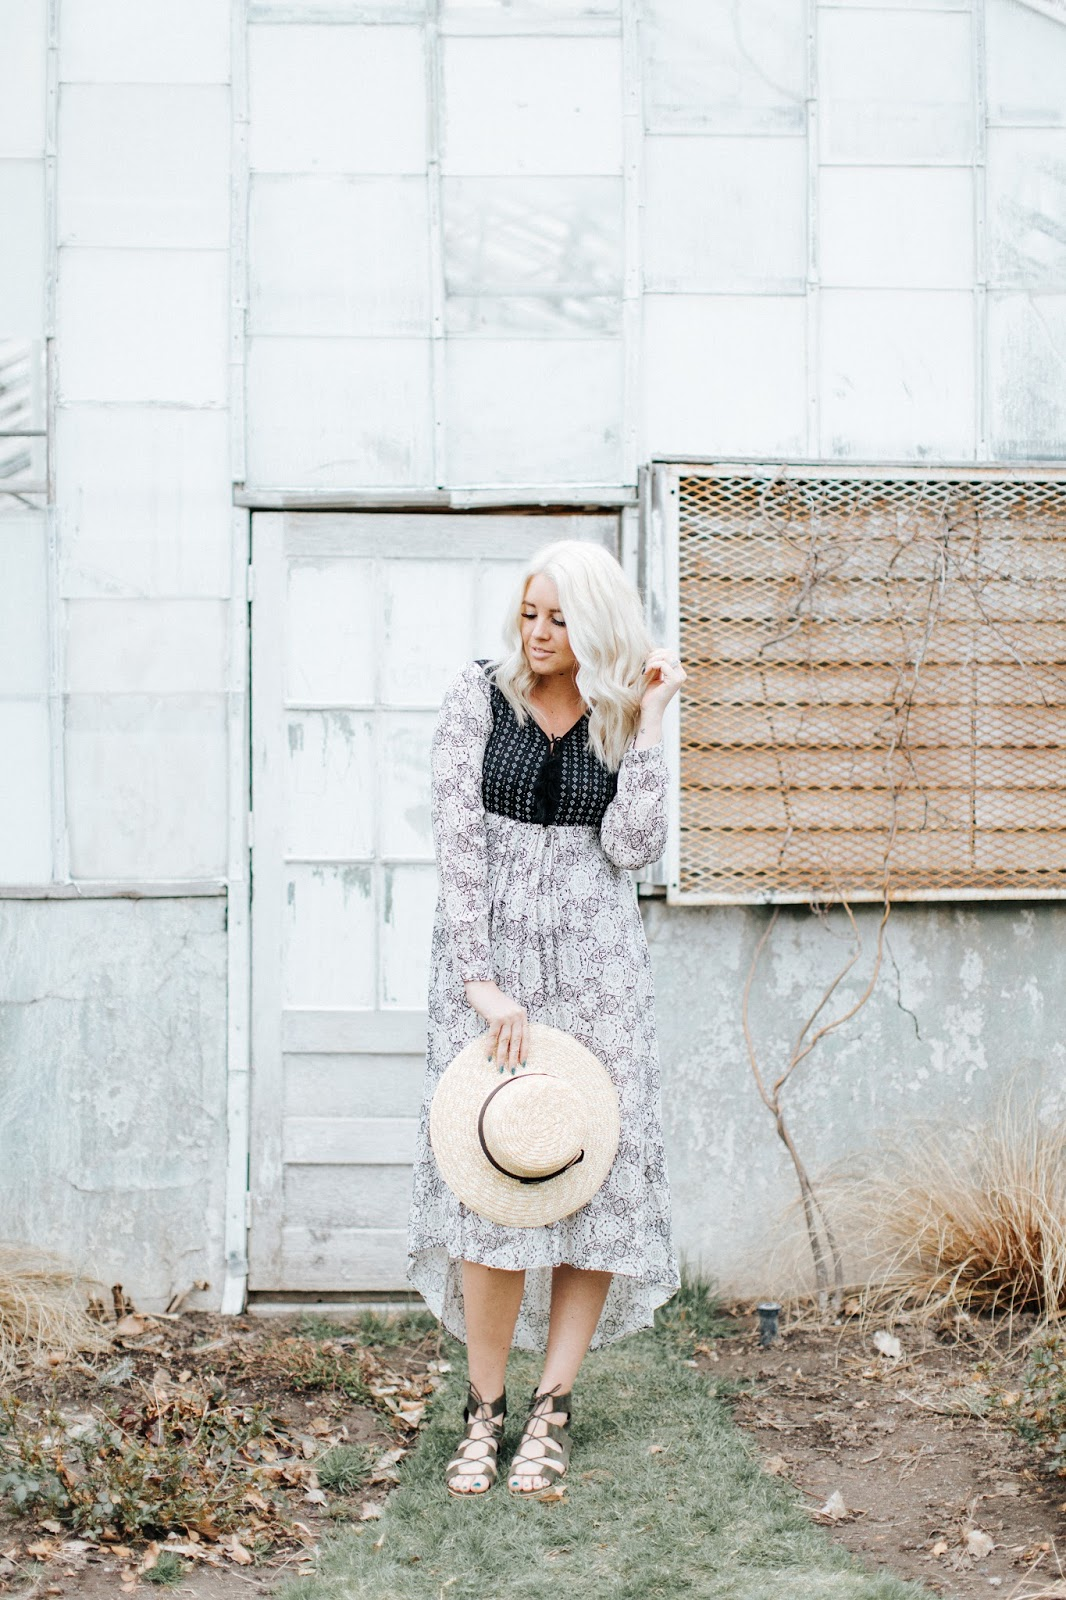 Modesty, Platinum Hair, Sun hat